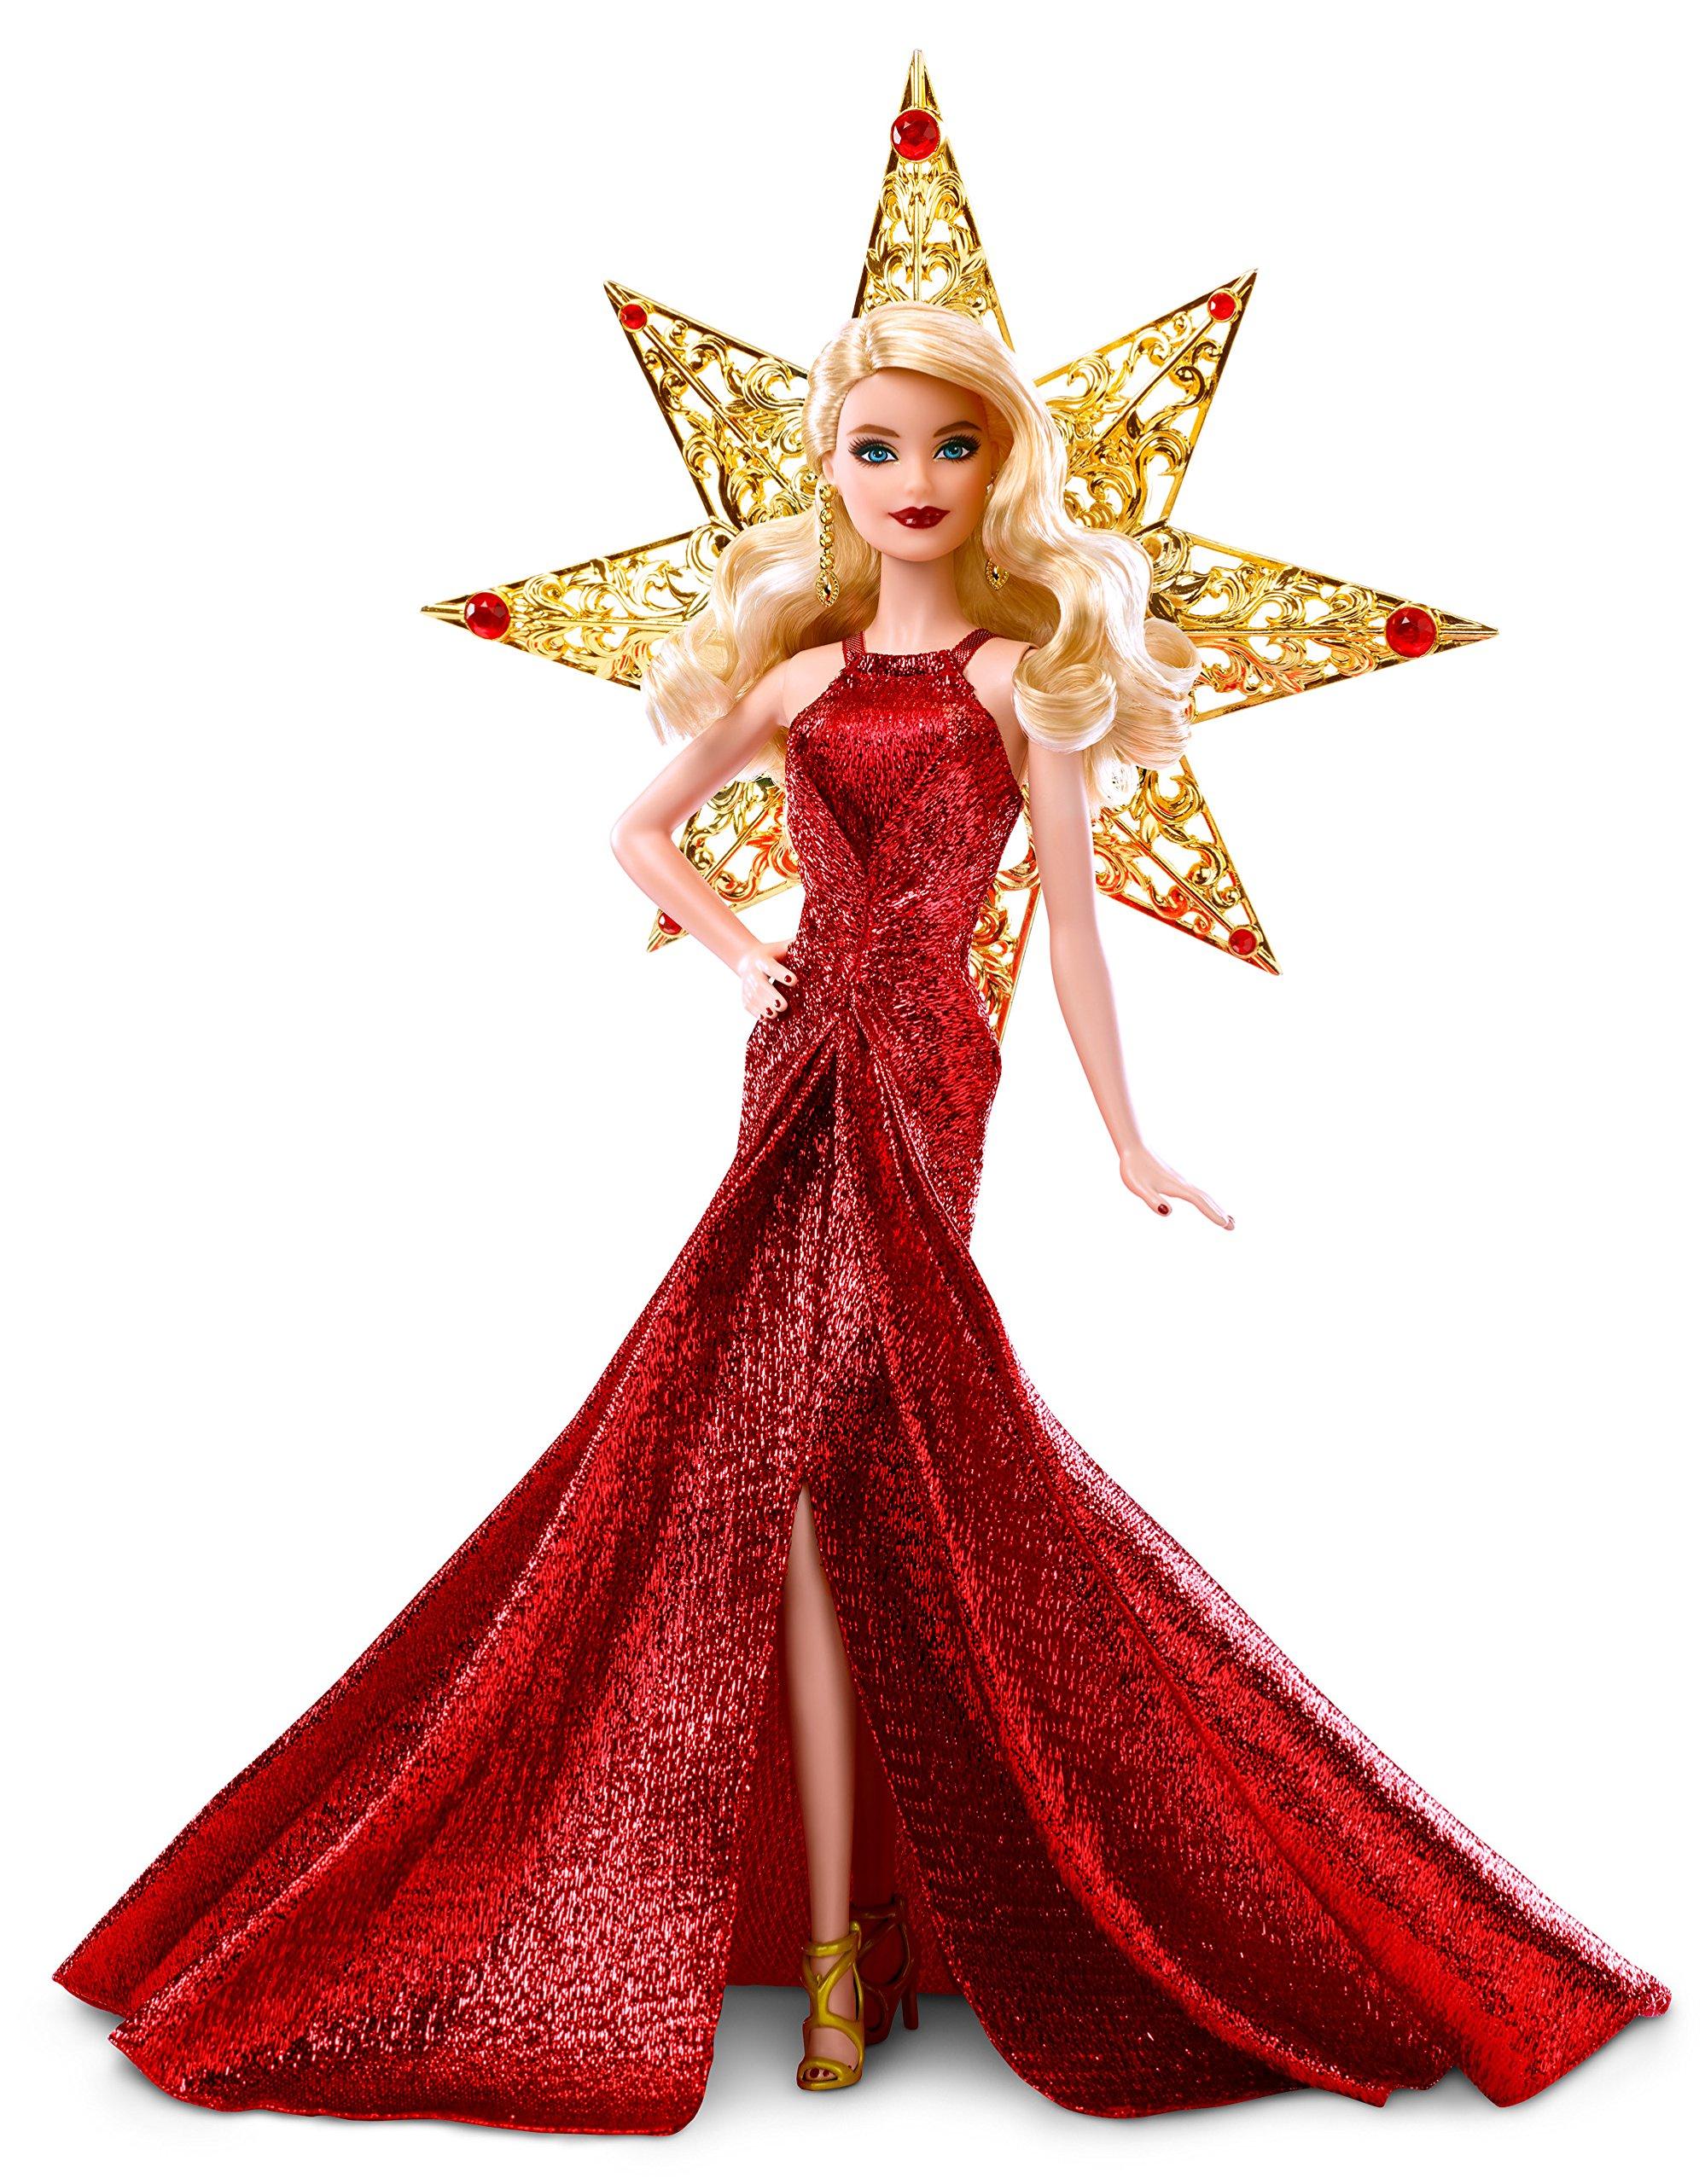 2017 holiday barbie doll barbie wiki fandom powered by wikia - Barbie de noel 2012 ...